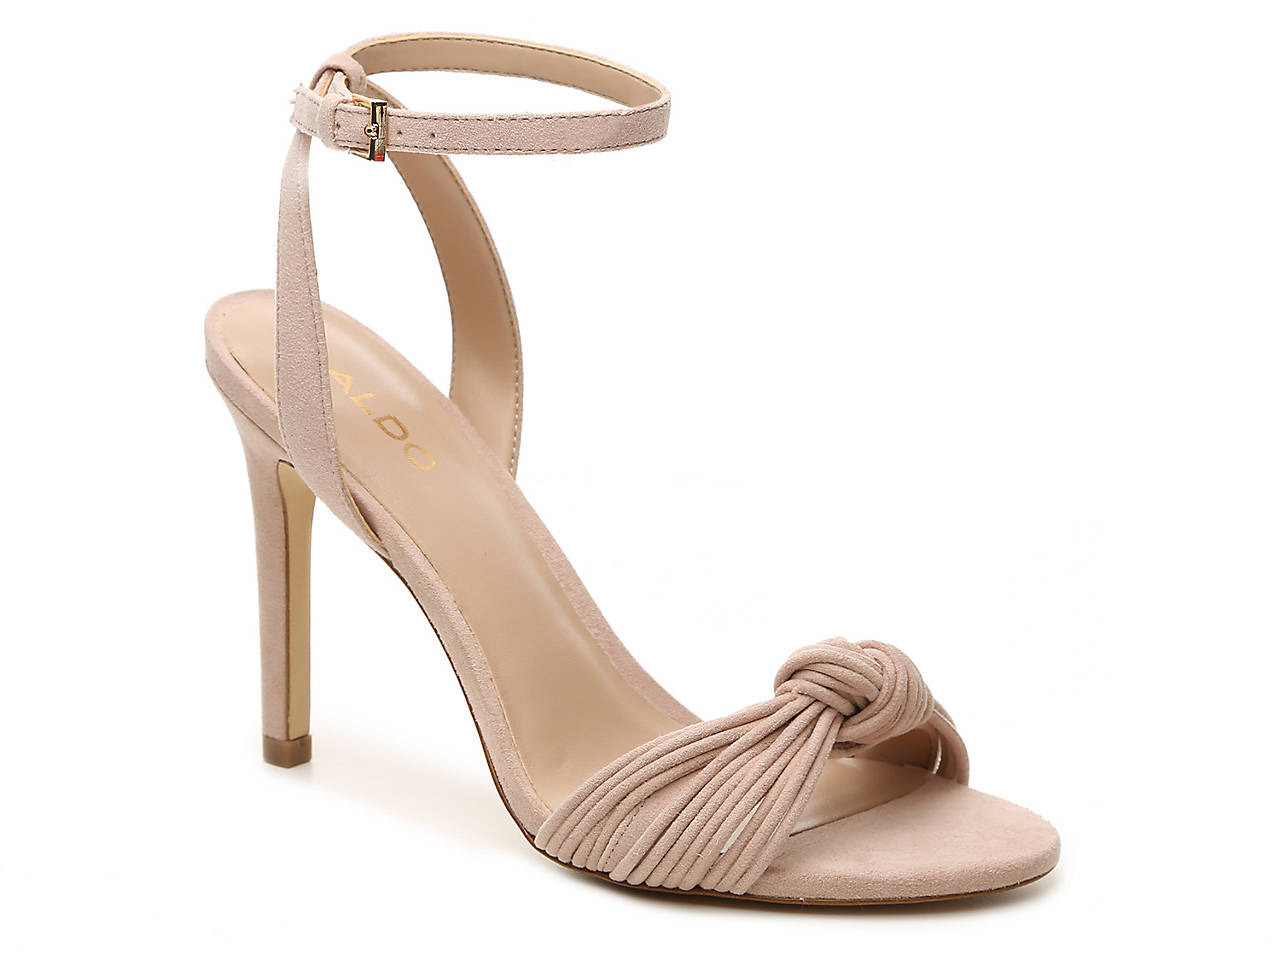 Black sandals at dsw - Toilla Sandal